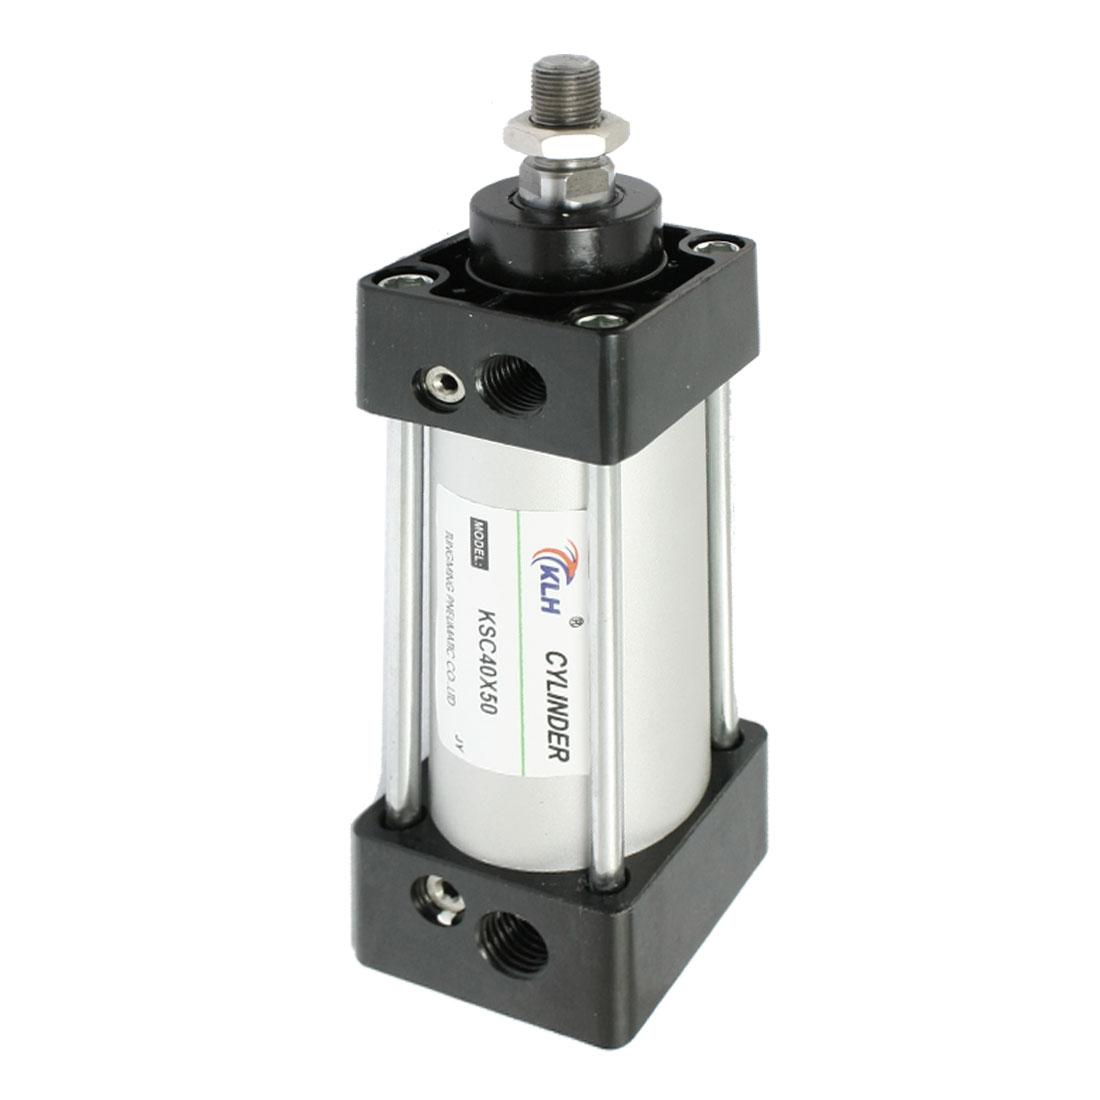 KSC40x50 40mm Bore 50mm Stroke Single Rod Pneumatic Air Cylinder